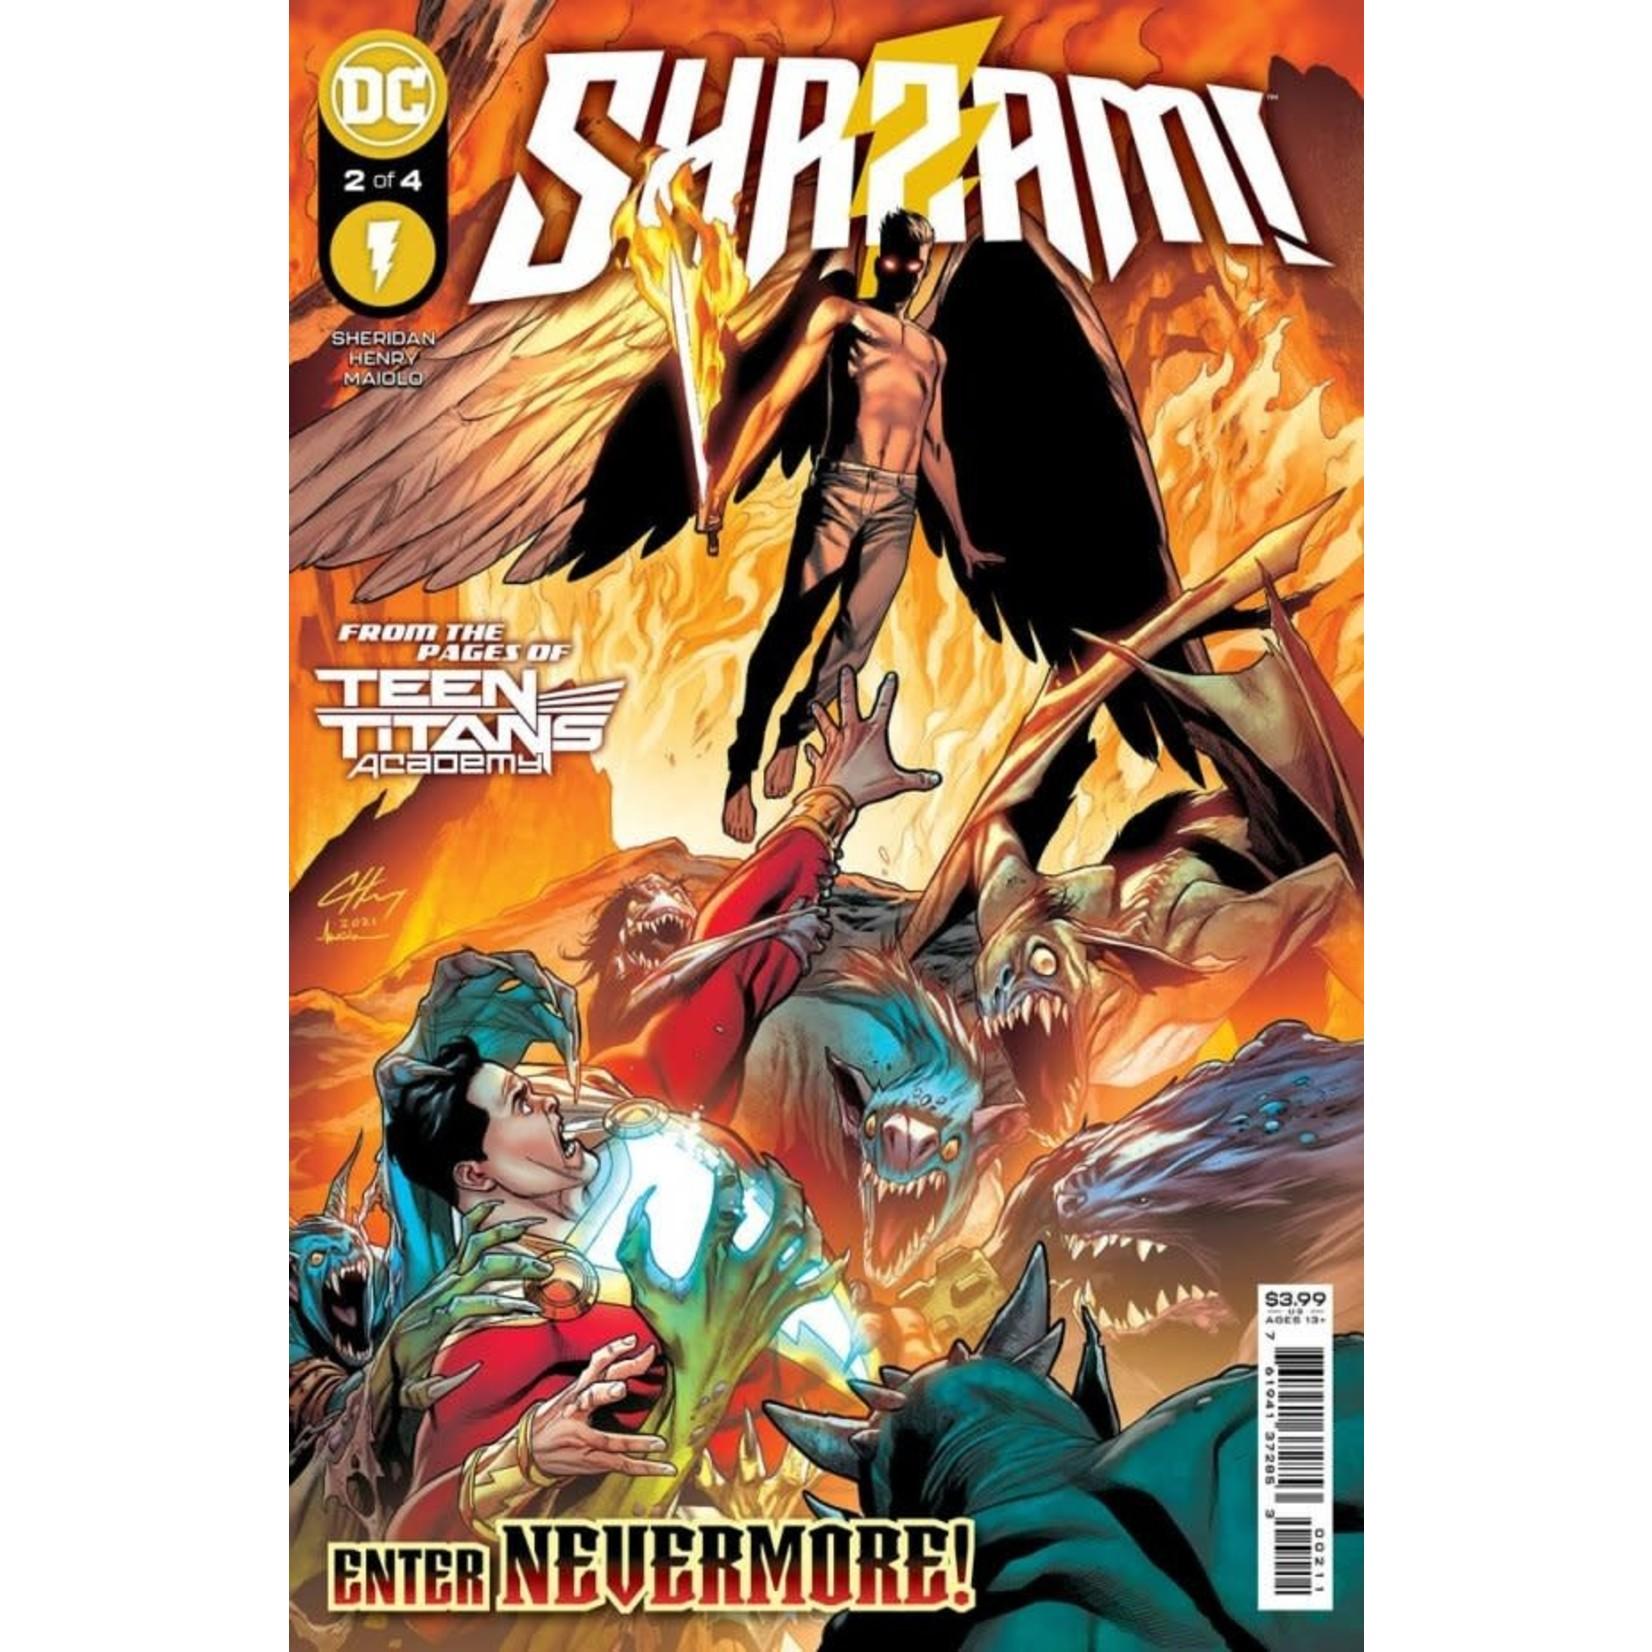 DC Comics Shazam! #2